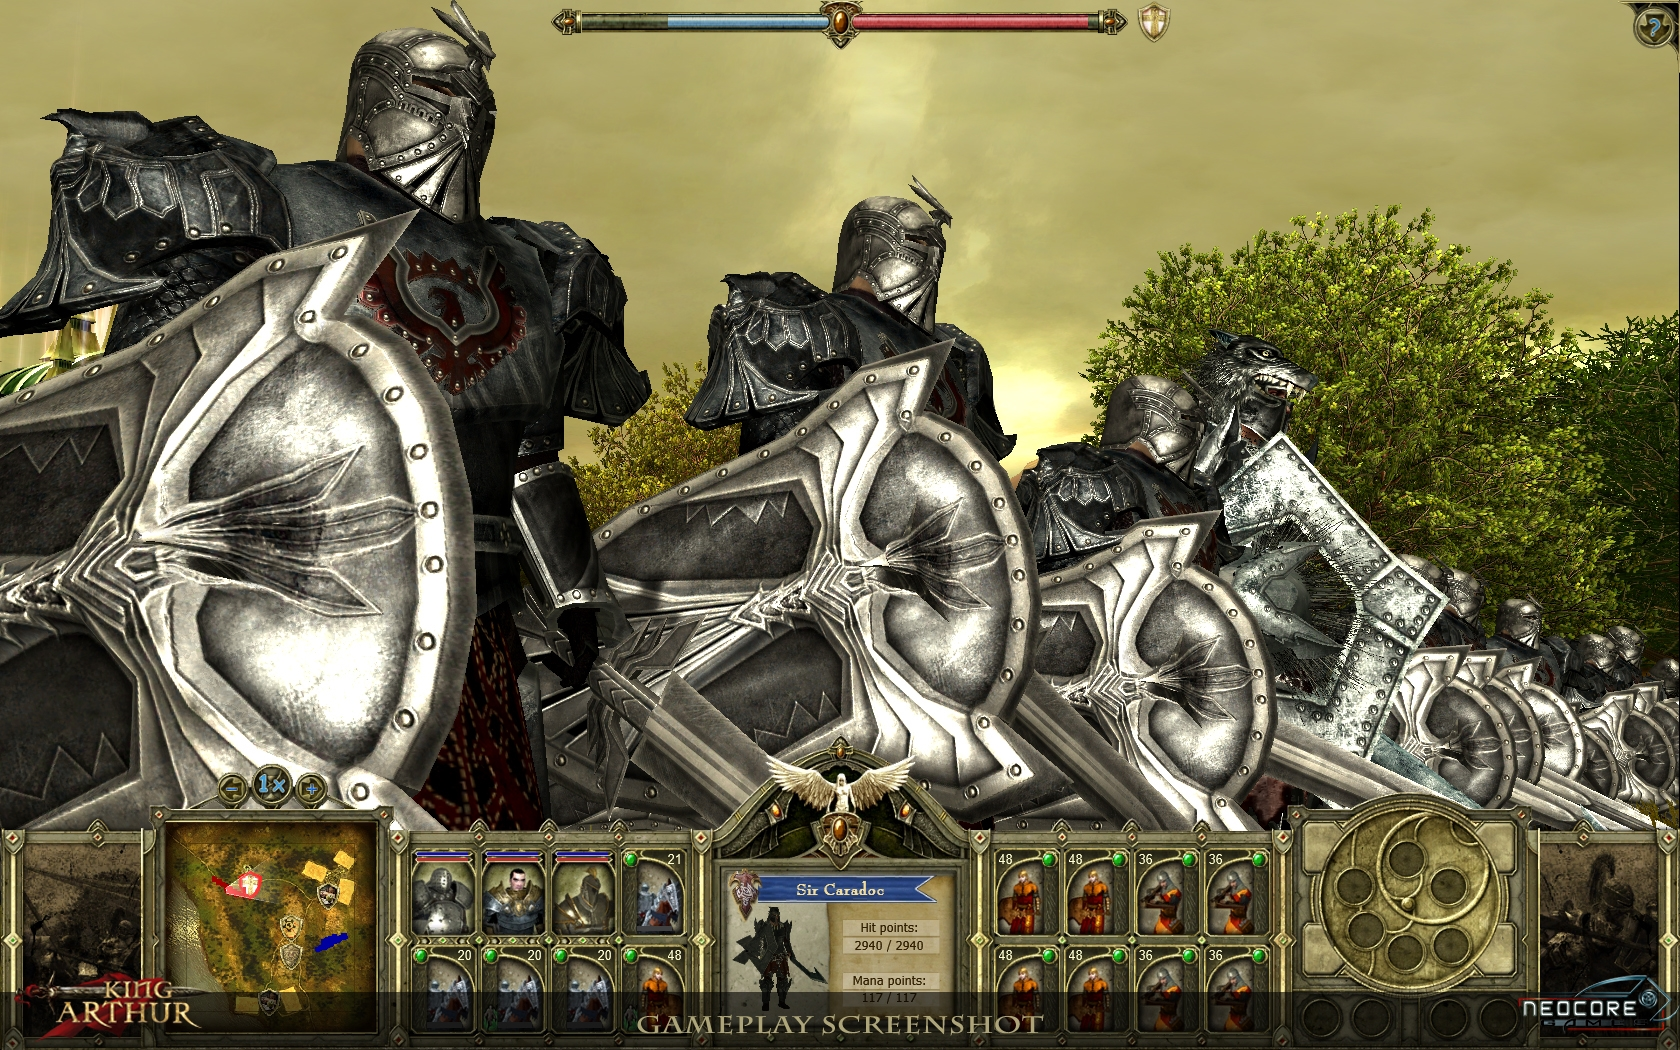 King Arthur Collection   ROW (9f6db56e-23db-499c-bdd9-6a55ea7bf5a8)